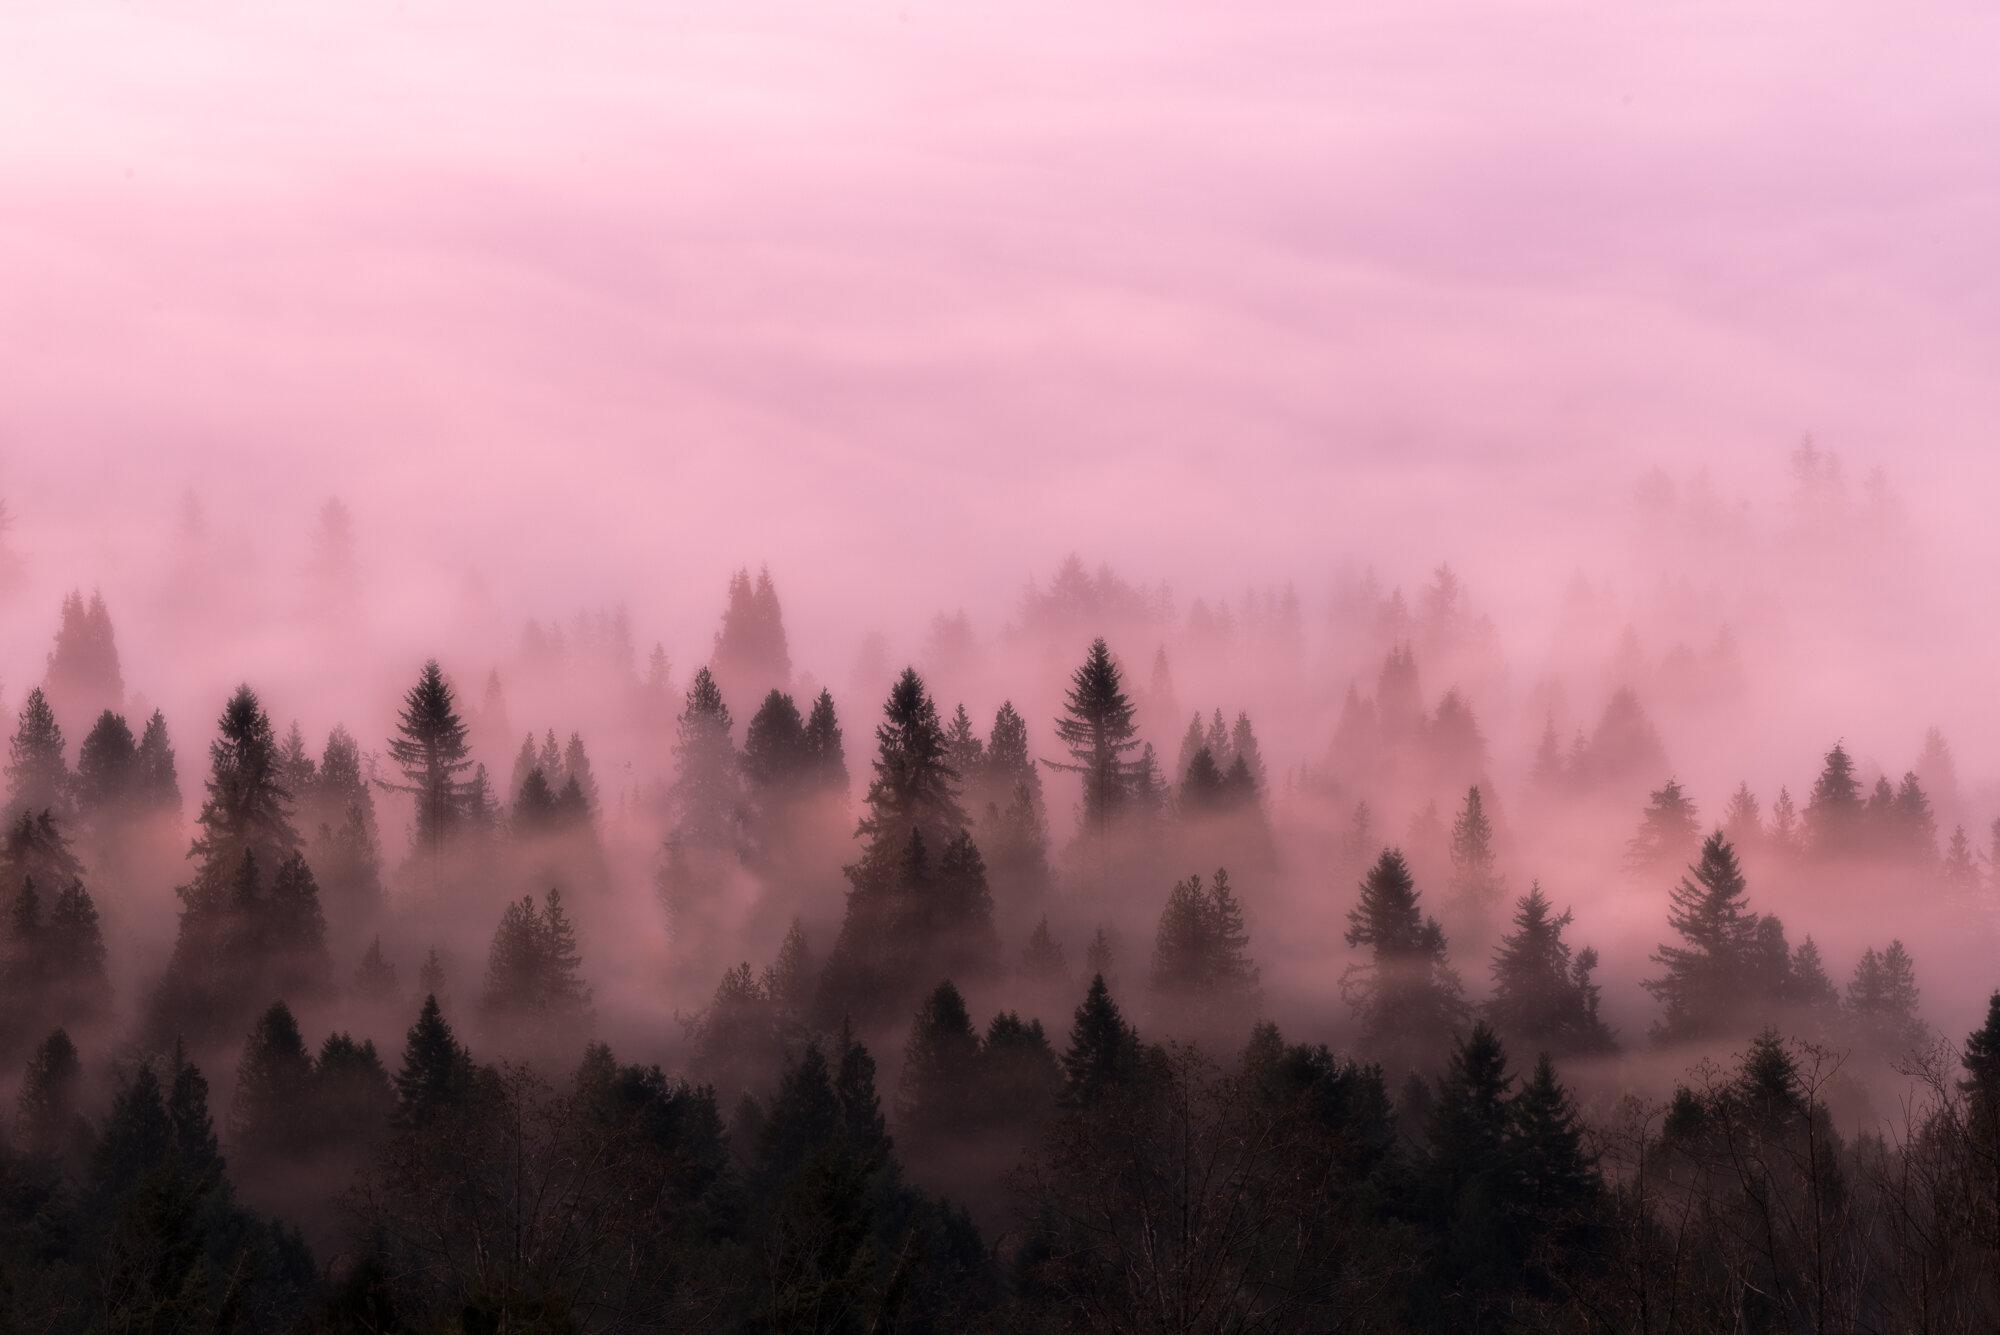 Fine Art Photography: 'Foggy Morning Pastels'